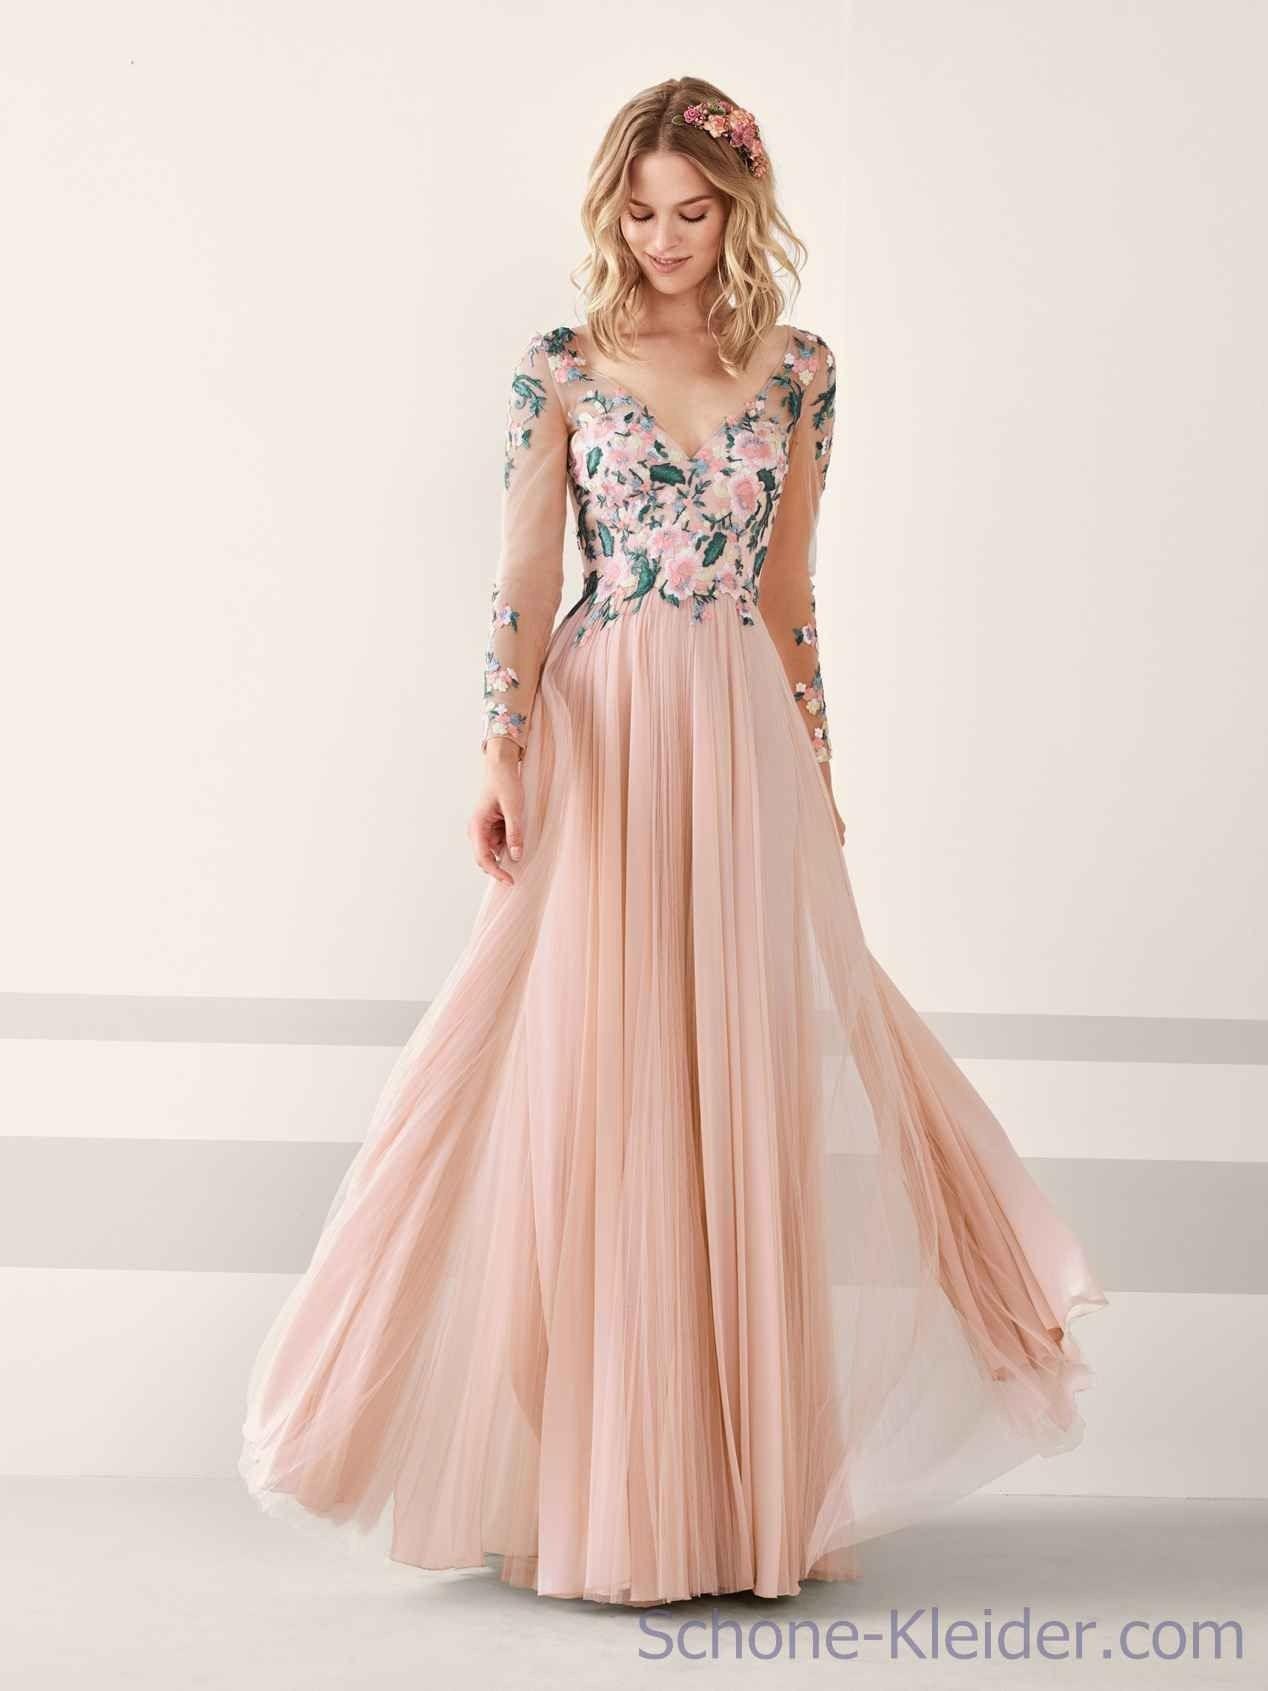 15 Genial Abendkleid Junge Mode Ärmel20 Top Abendkleid Junge Mode Design